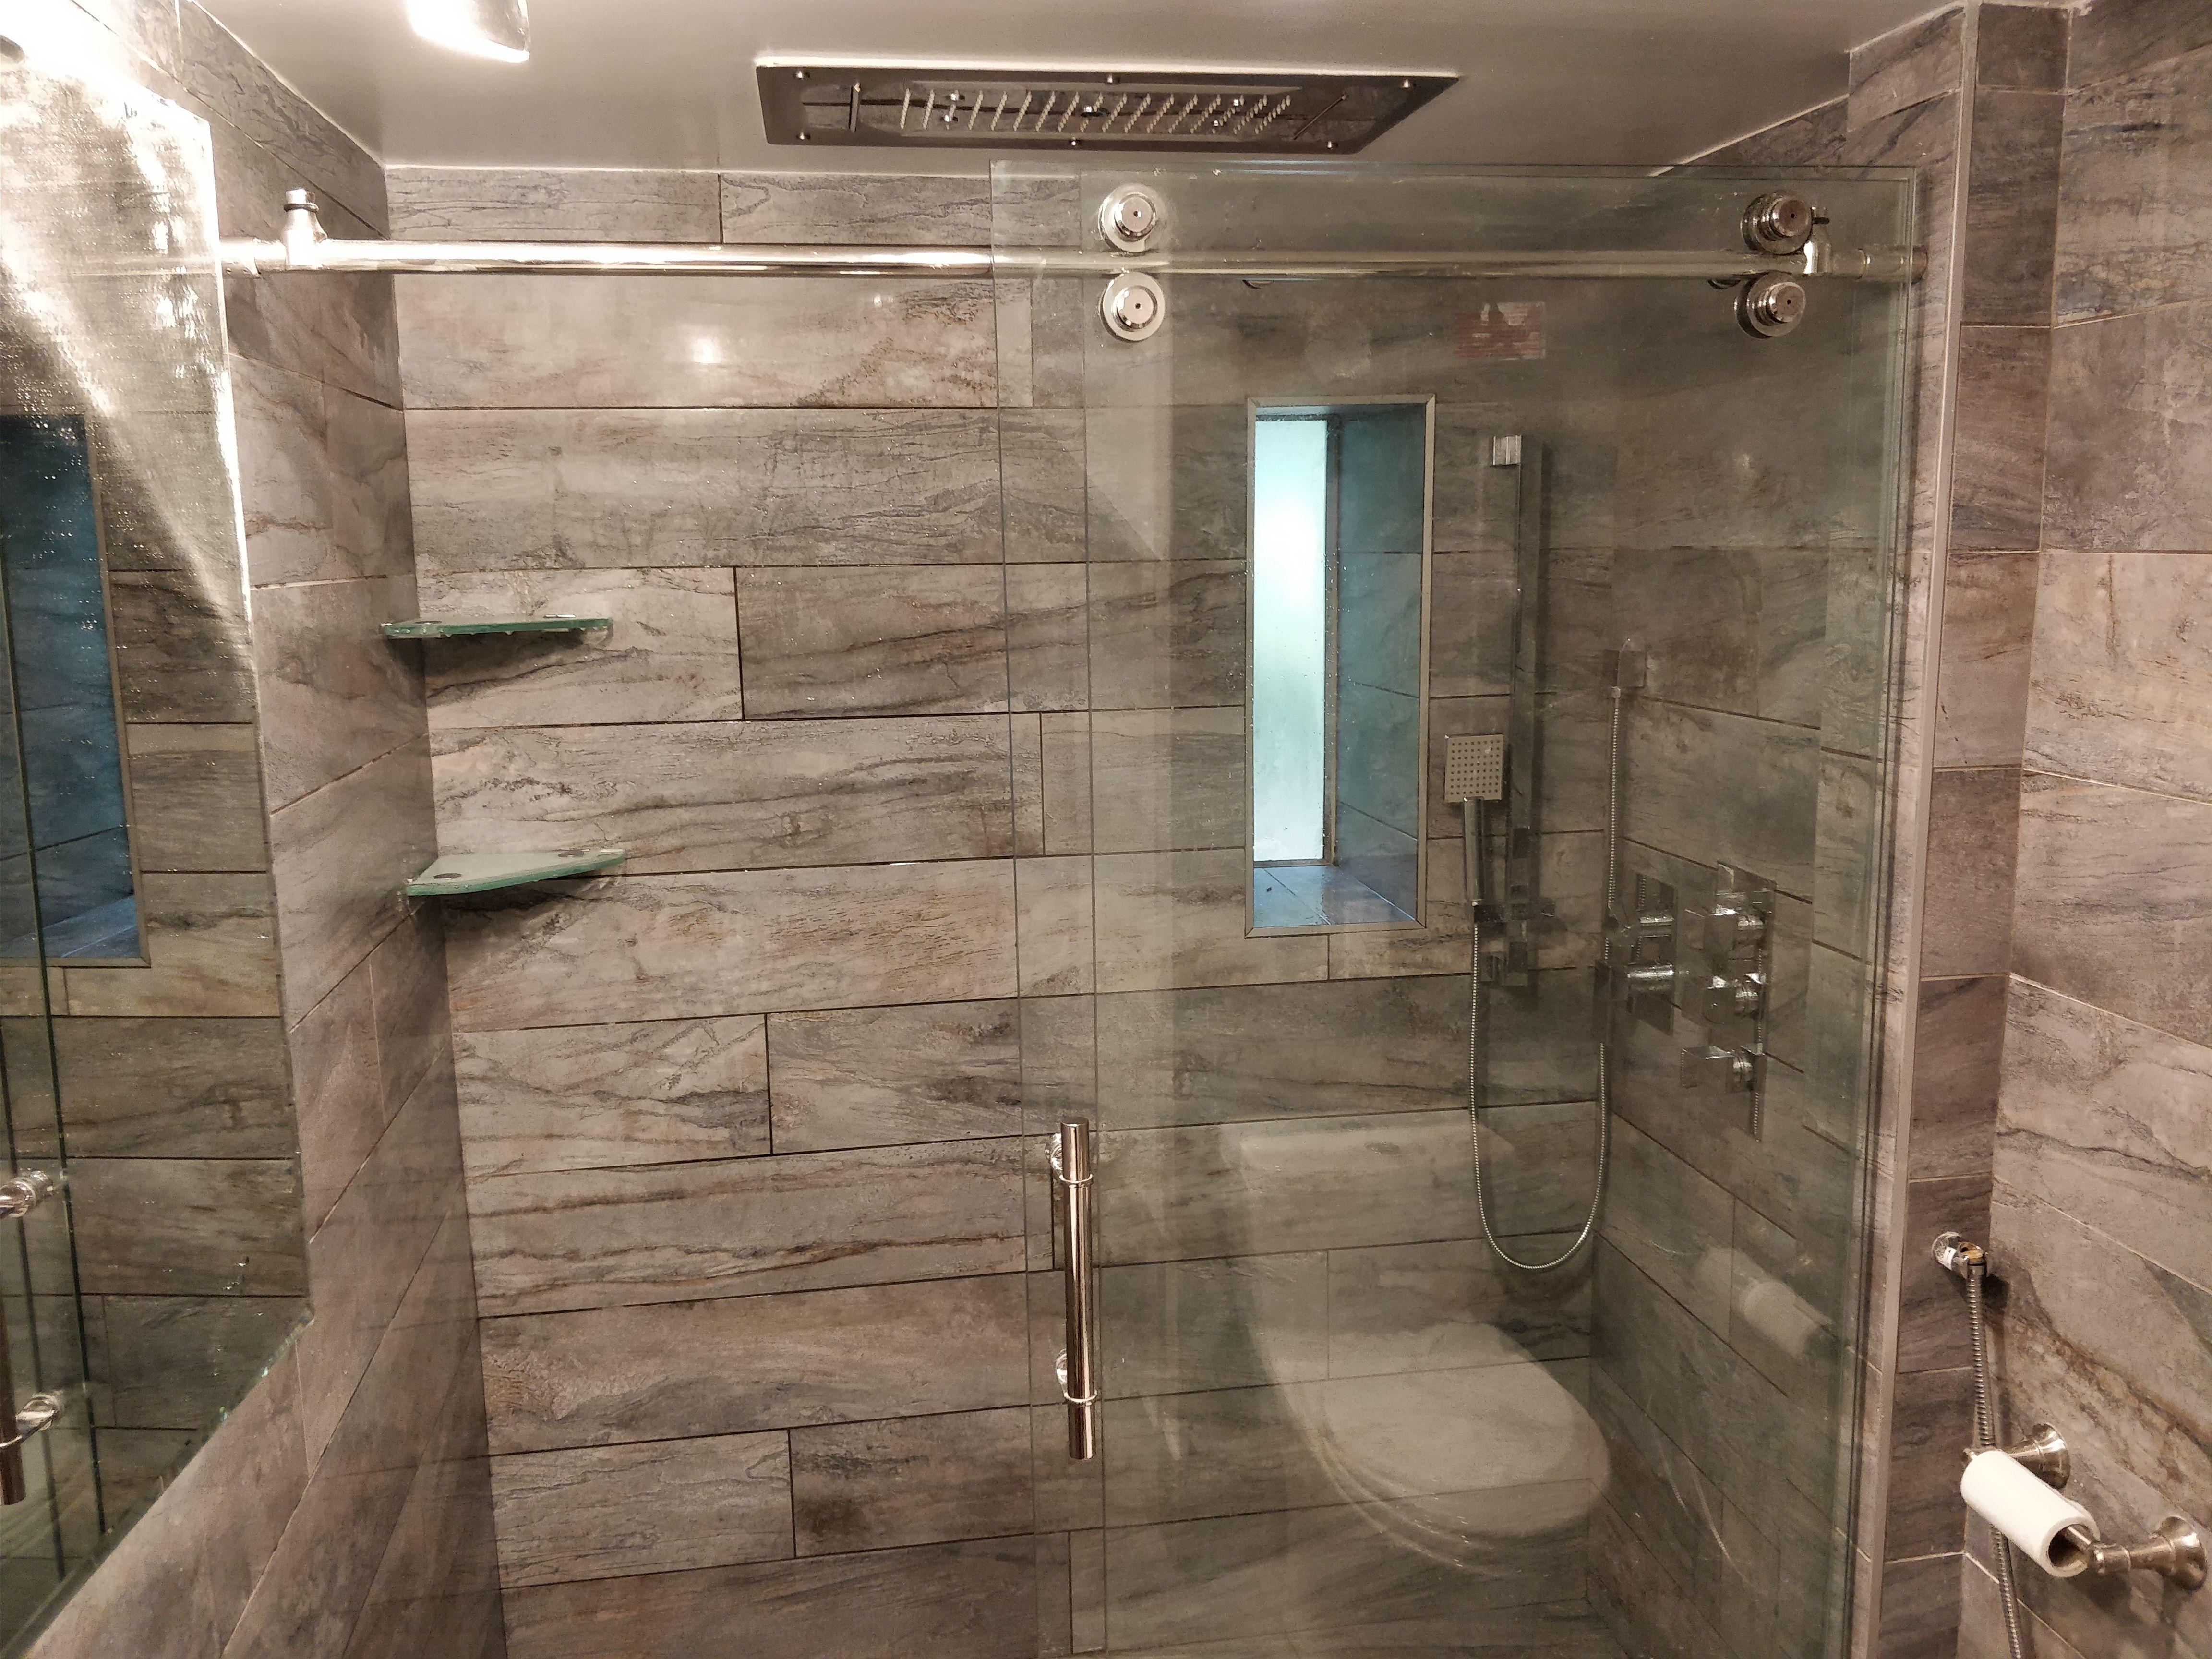 Average Cost To Remodel Half Bathroom Bathroom Remodel Cost